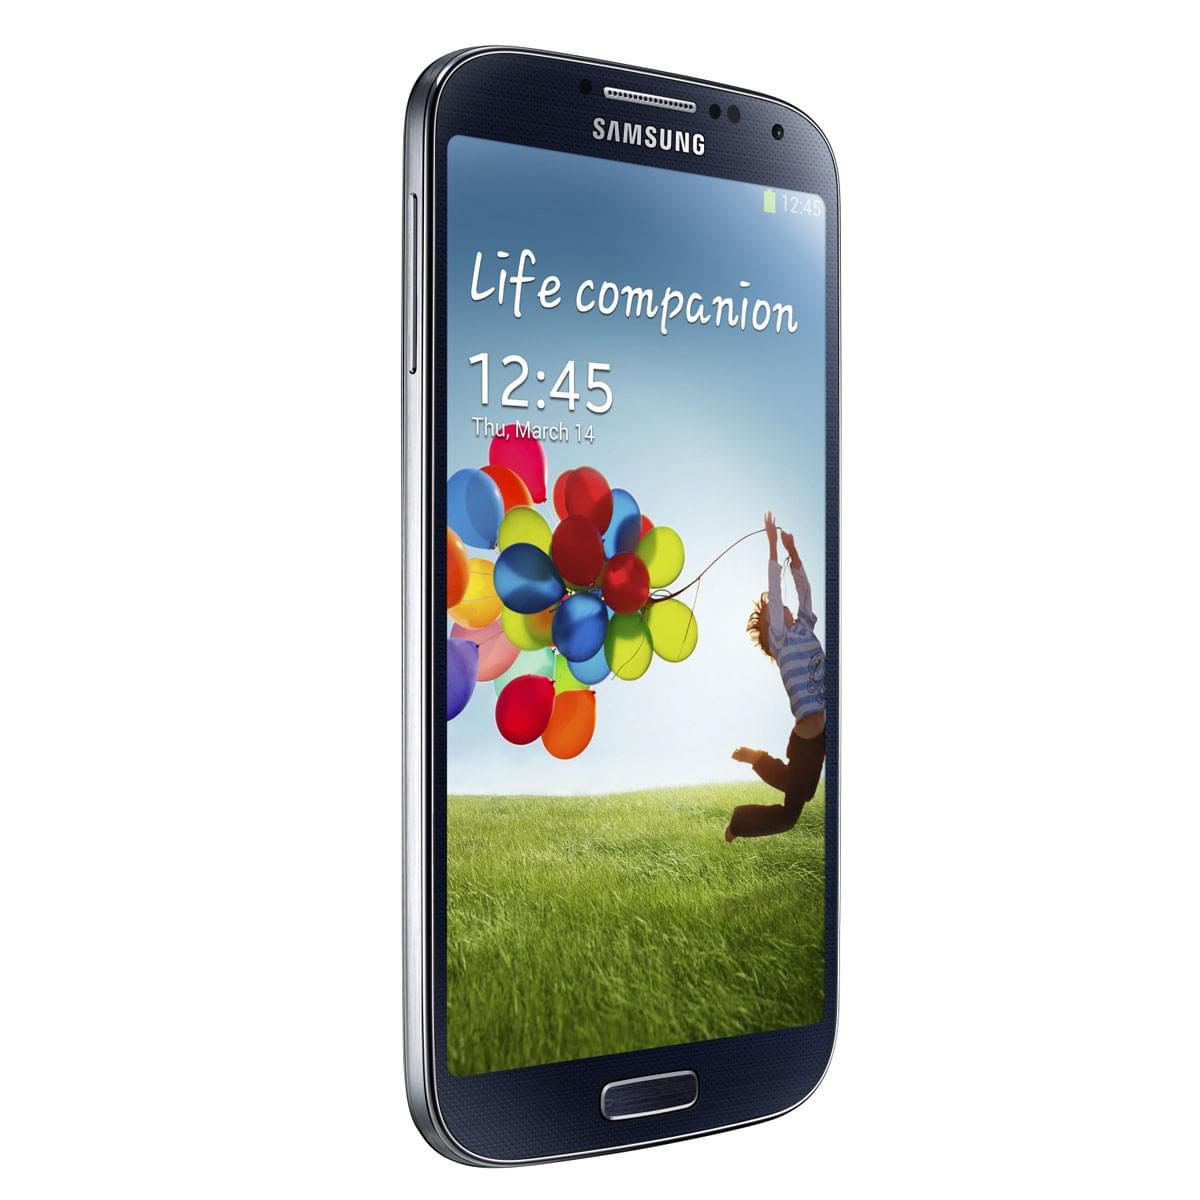 Samsung Galaxy S4 16Go Noir GT-I9505 Black Mist (GT-I9505ZKAXEF) - Achat / Vente Téléphonie sur Cybertek.fr - 0